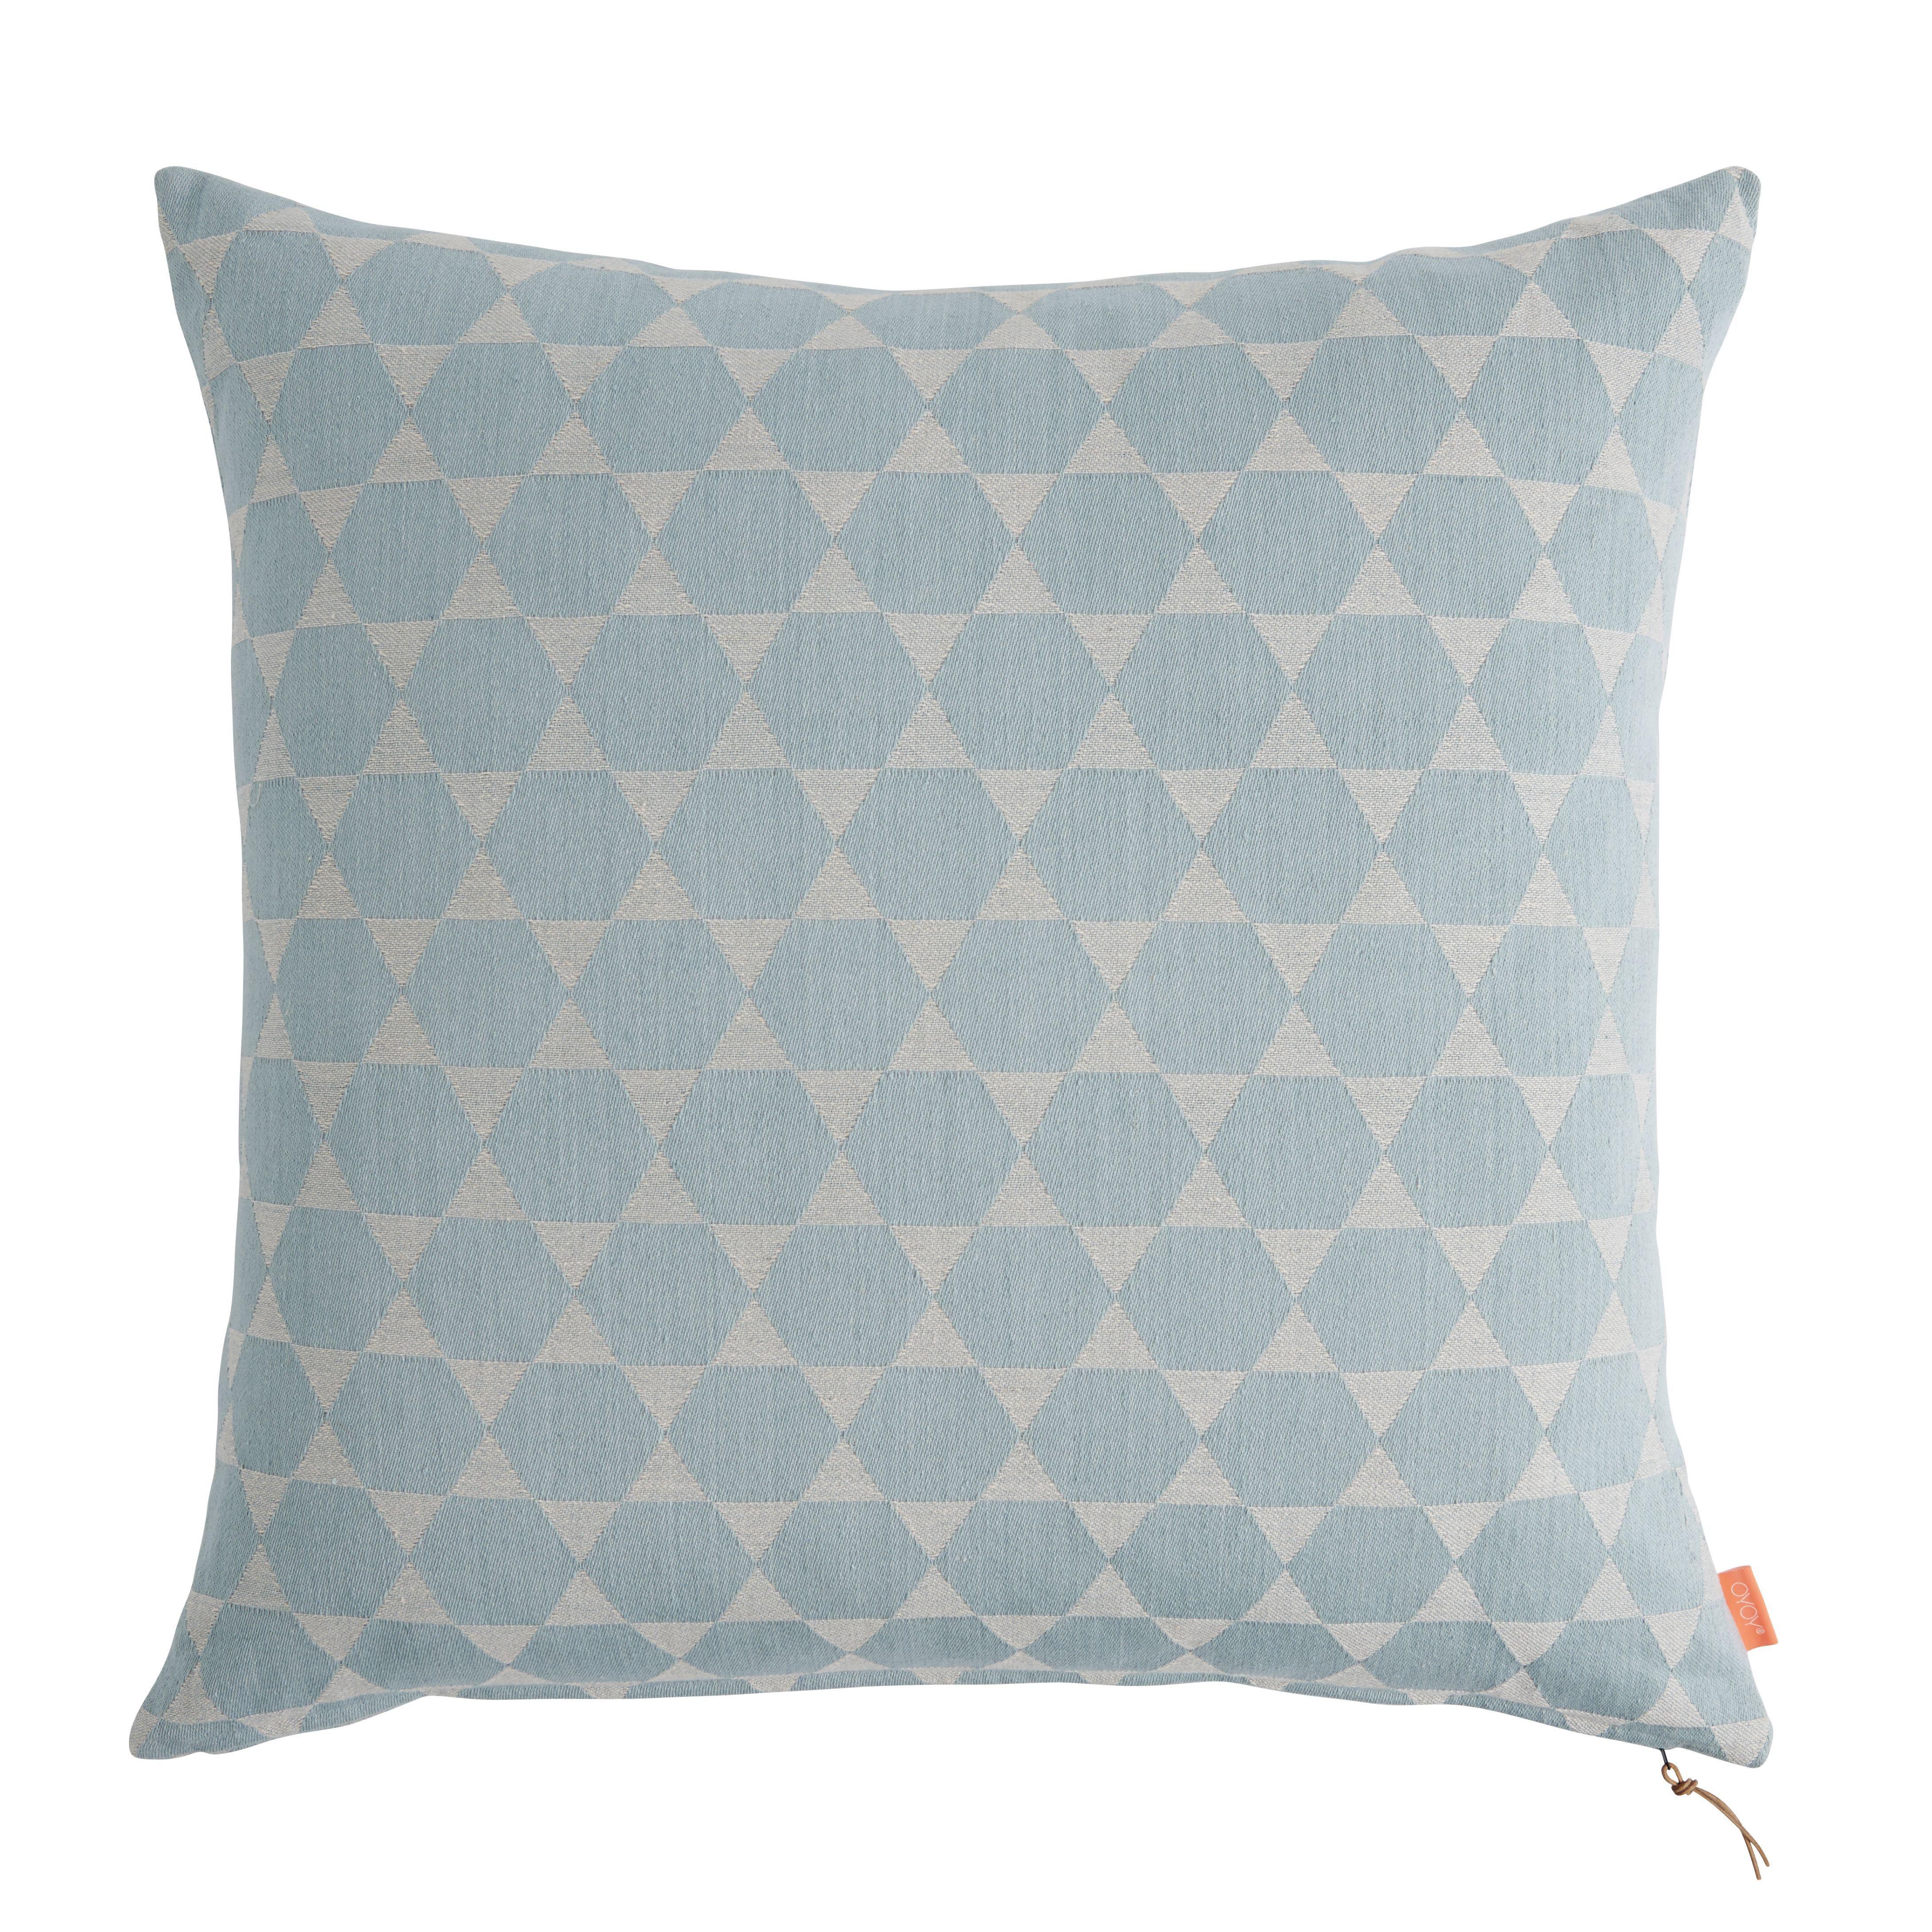 Floor Cushion In Dusty Mint & Light Grey Design By